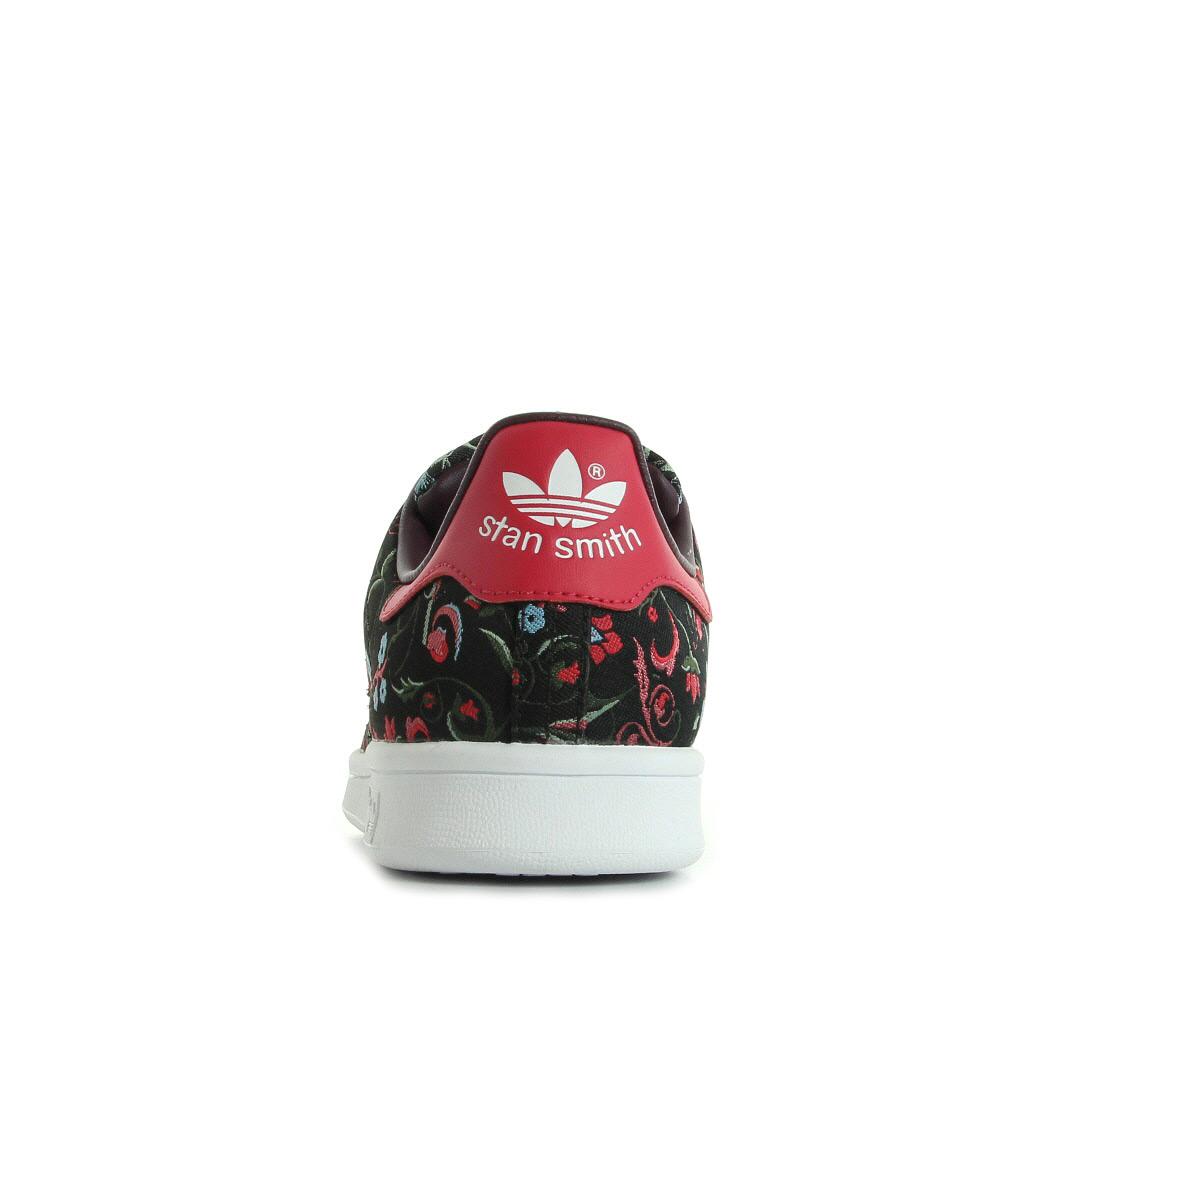 chaussures baskets adidas femme stan smith taille noir noire textile lacets ebay. Black Bedroom Furniture Sets. Home Design Ideas